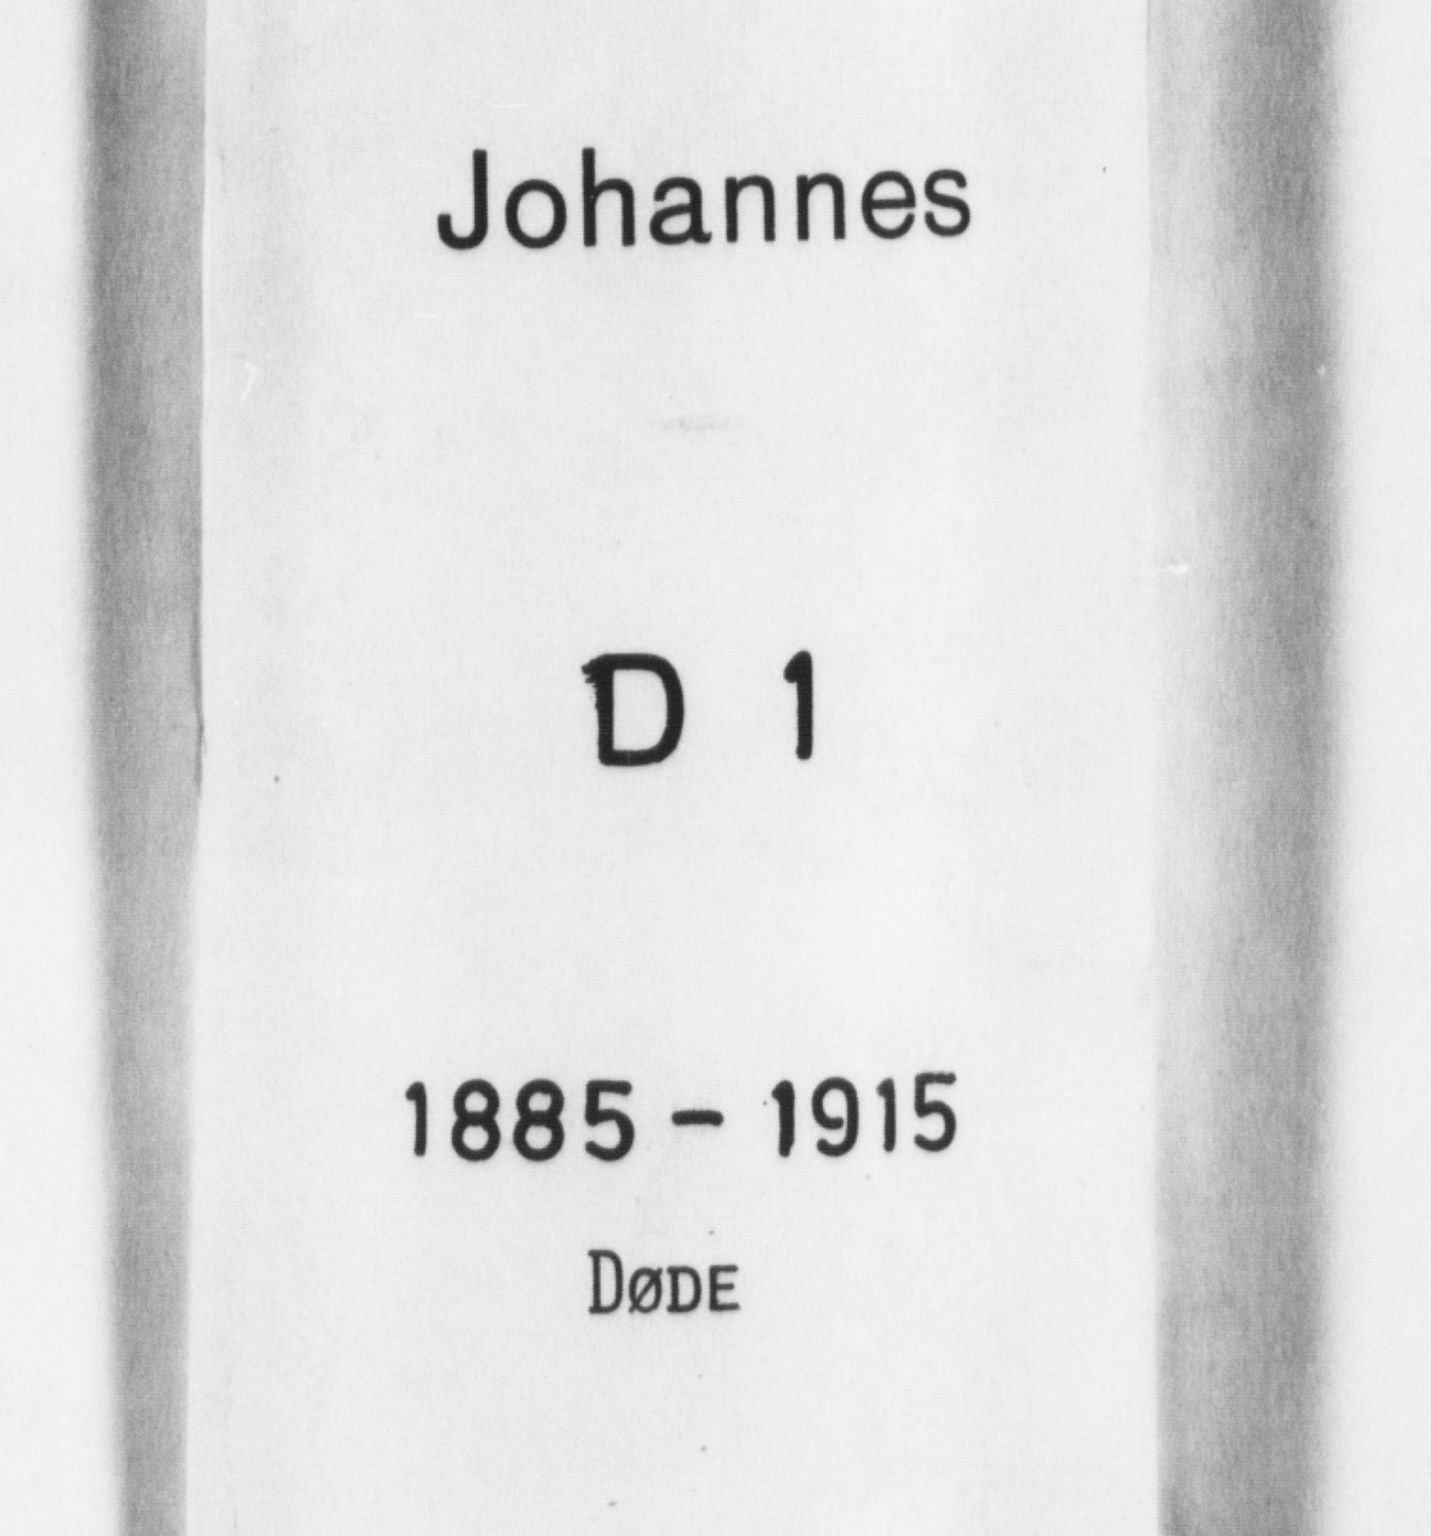 SAB, Johanneskirken Sokneprestembete, H/Hab: Klokkerbok nr. D 1, 1885-1915